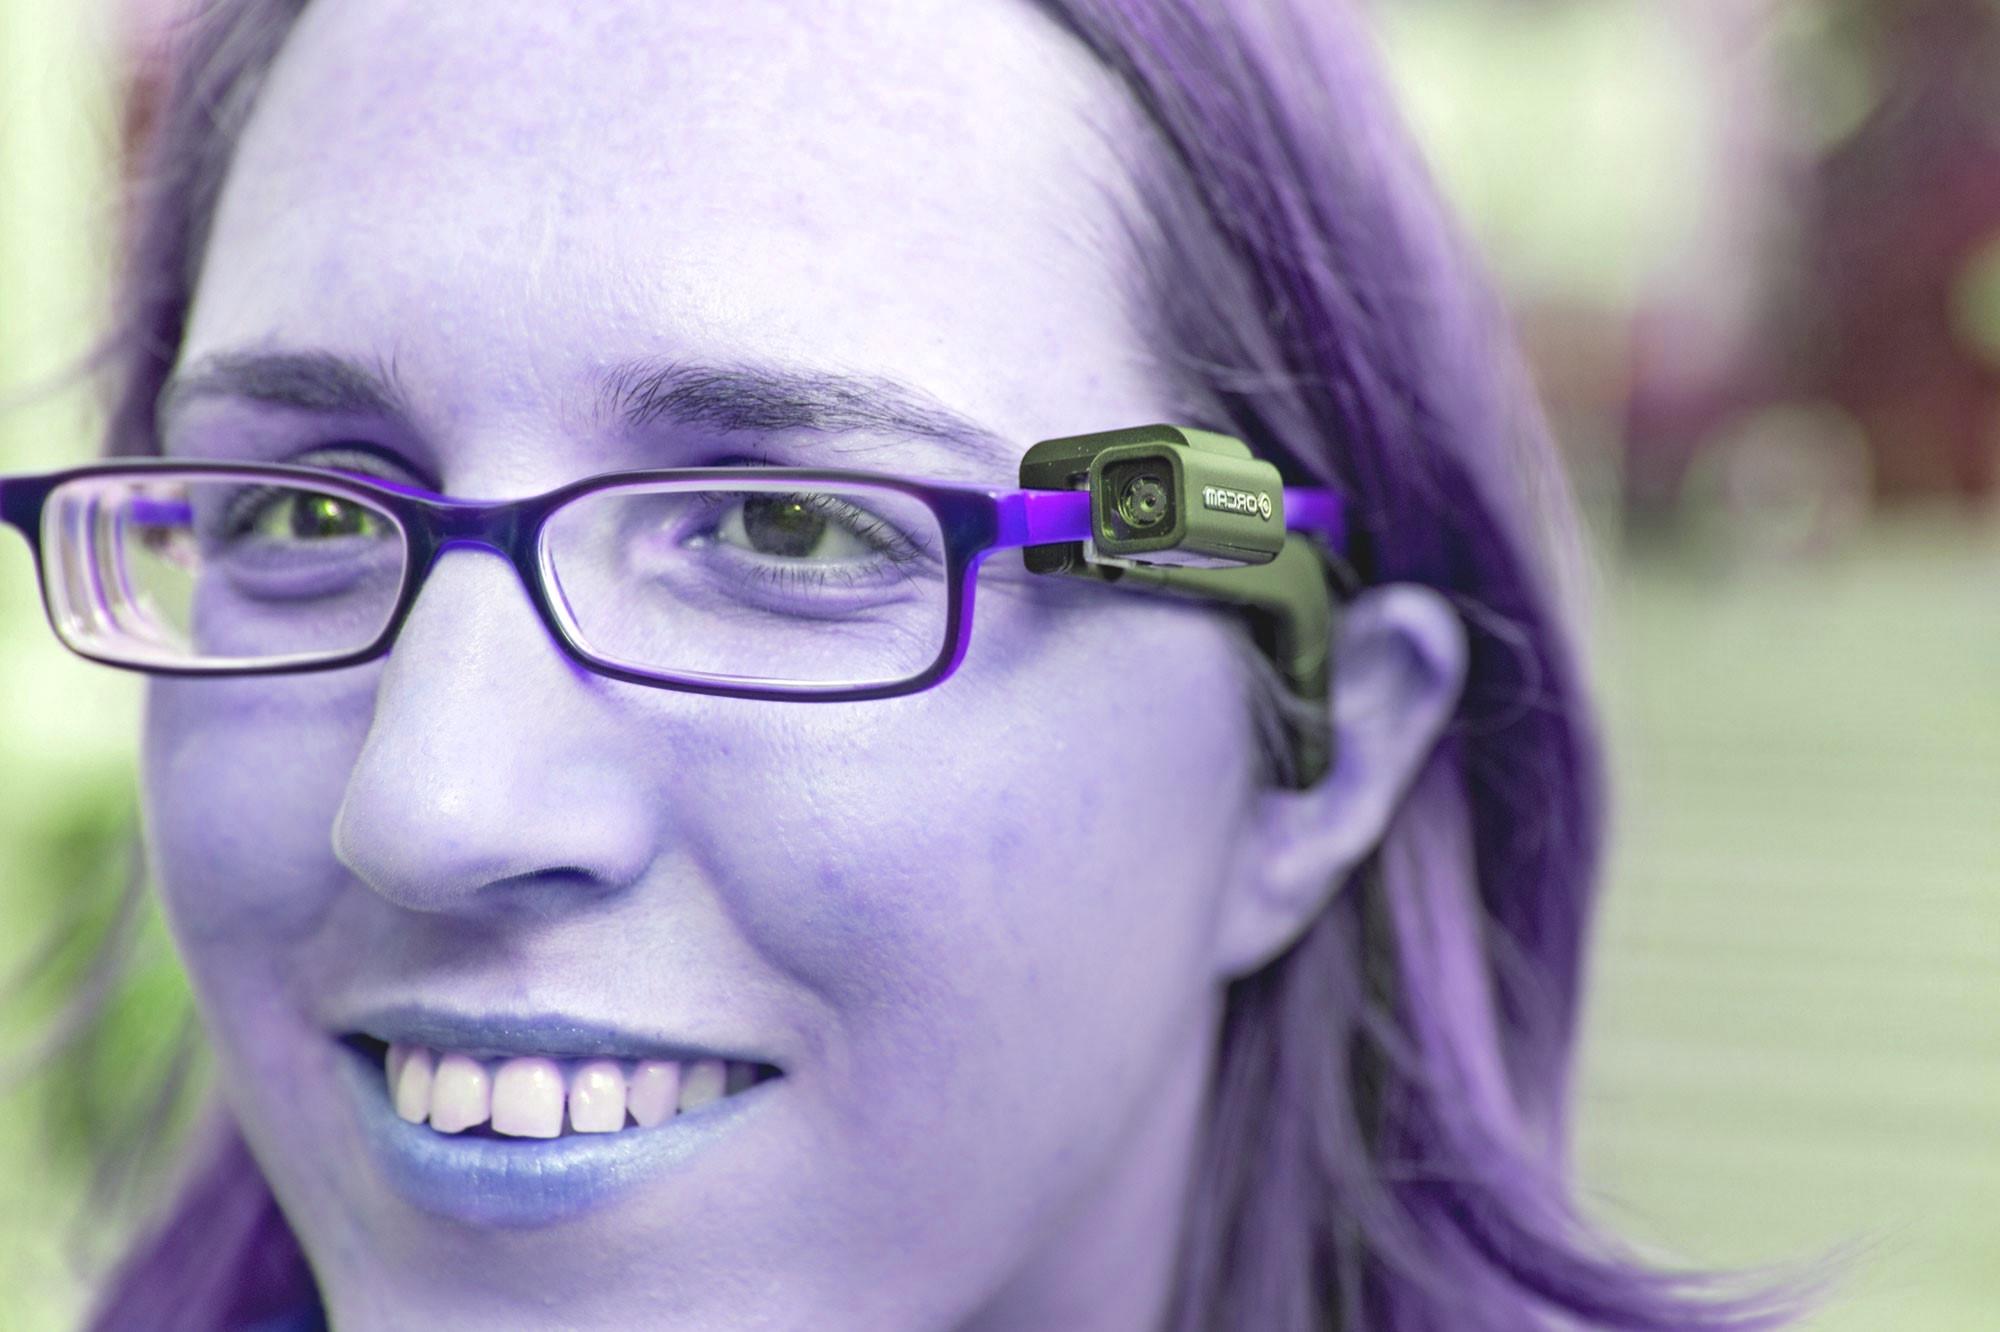 lunettes-connectee-realite-augmentee.jpg